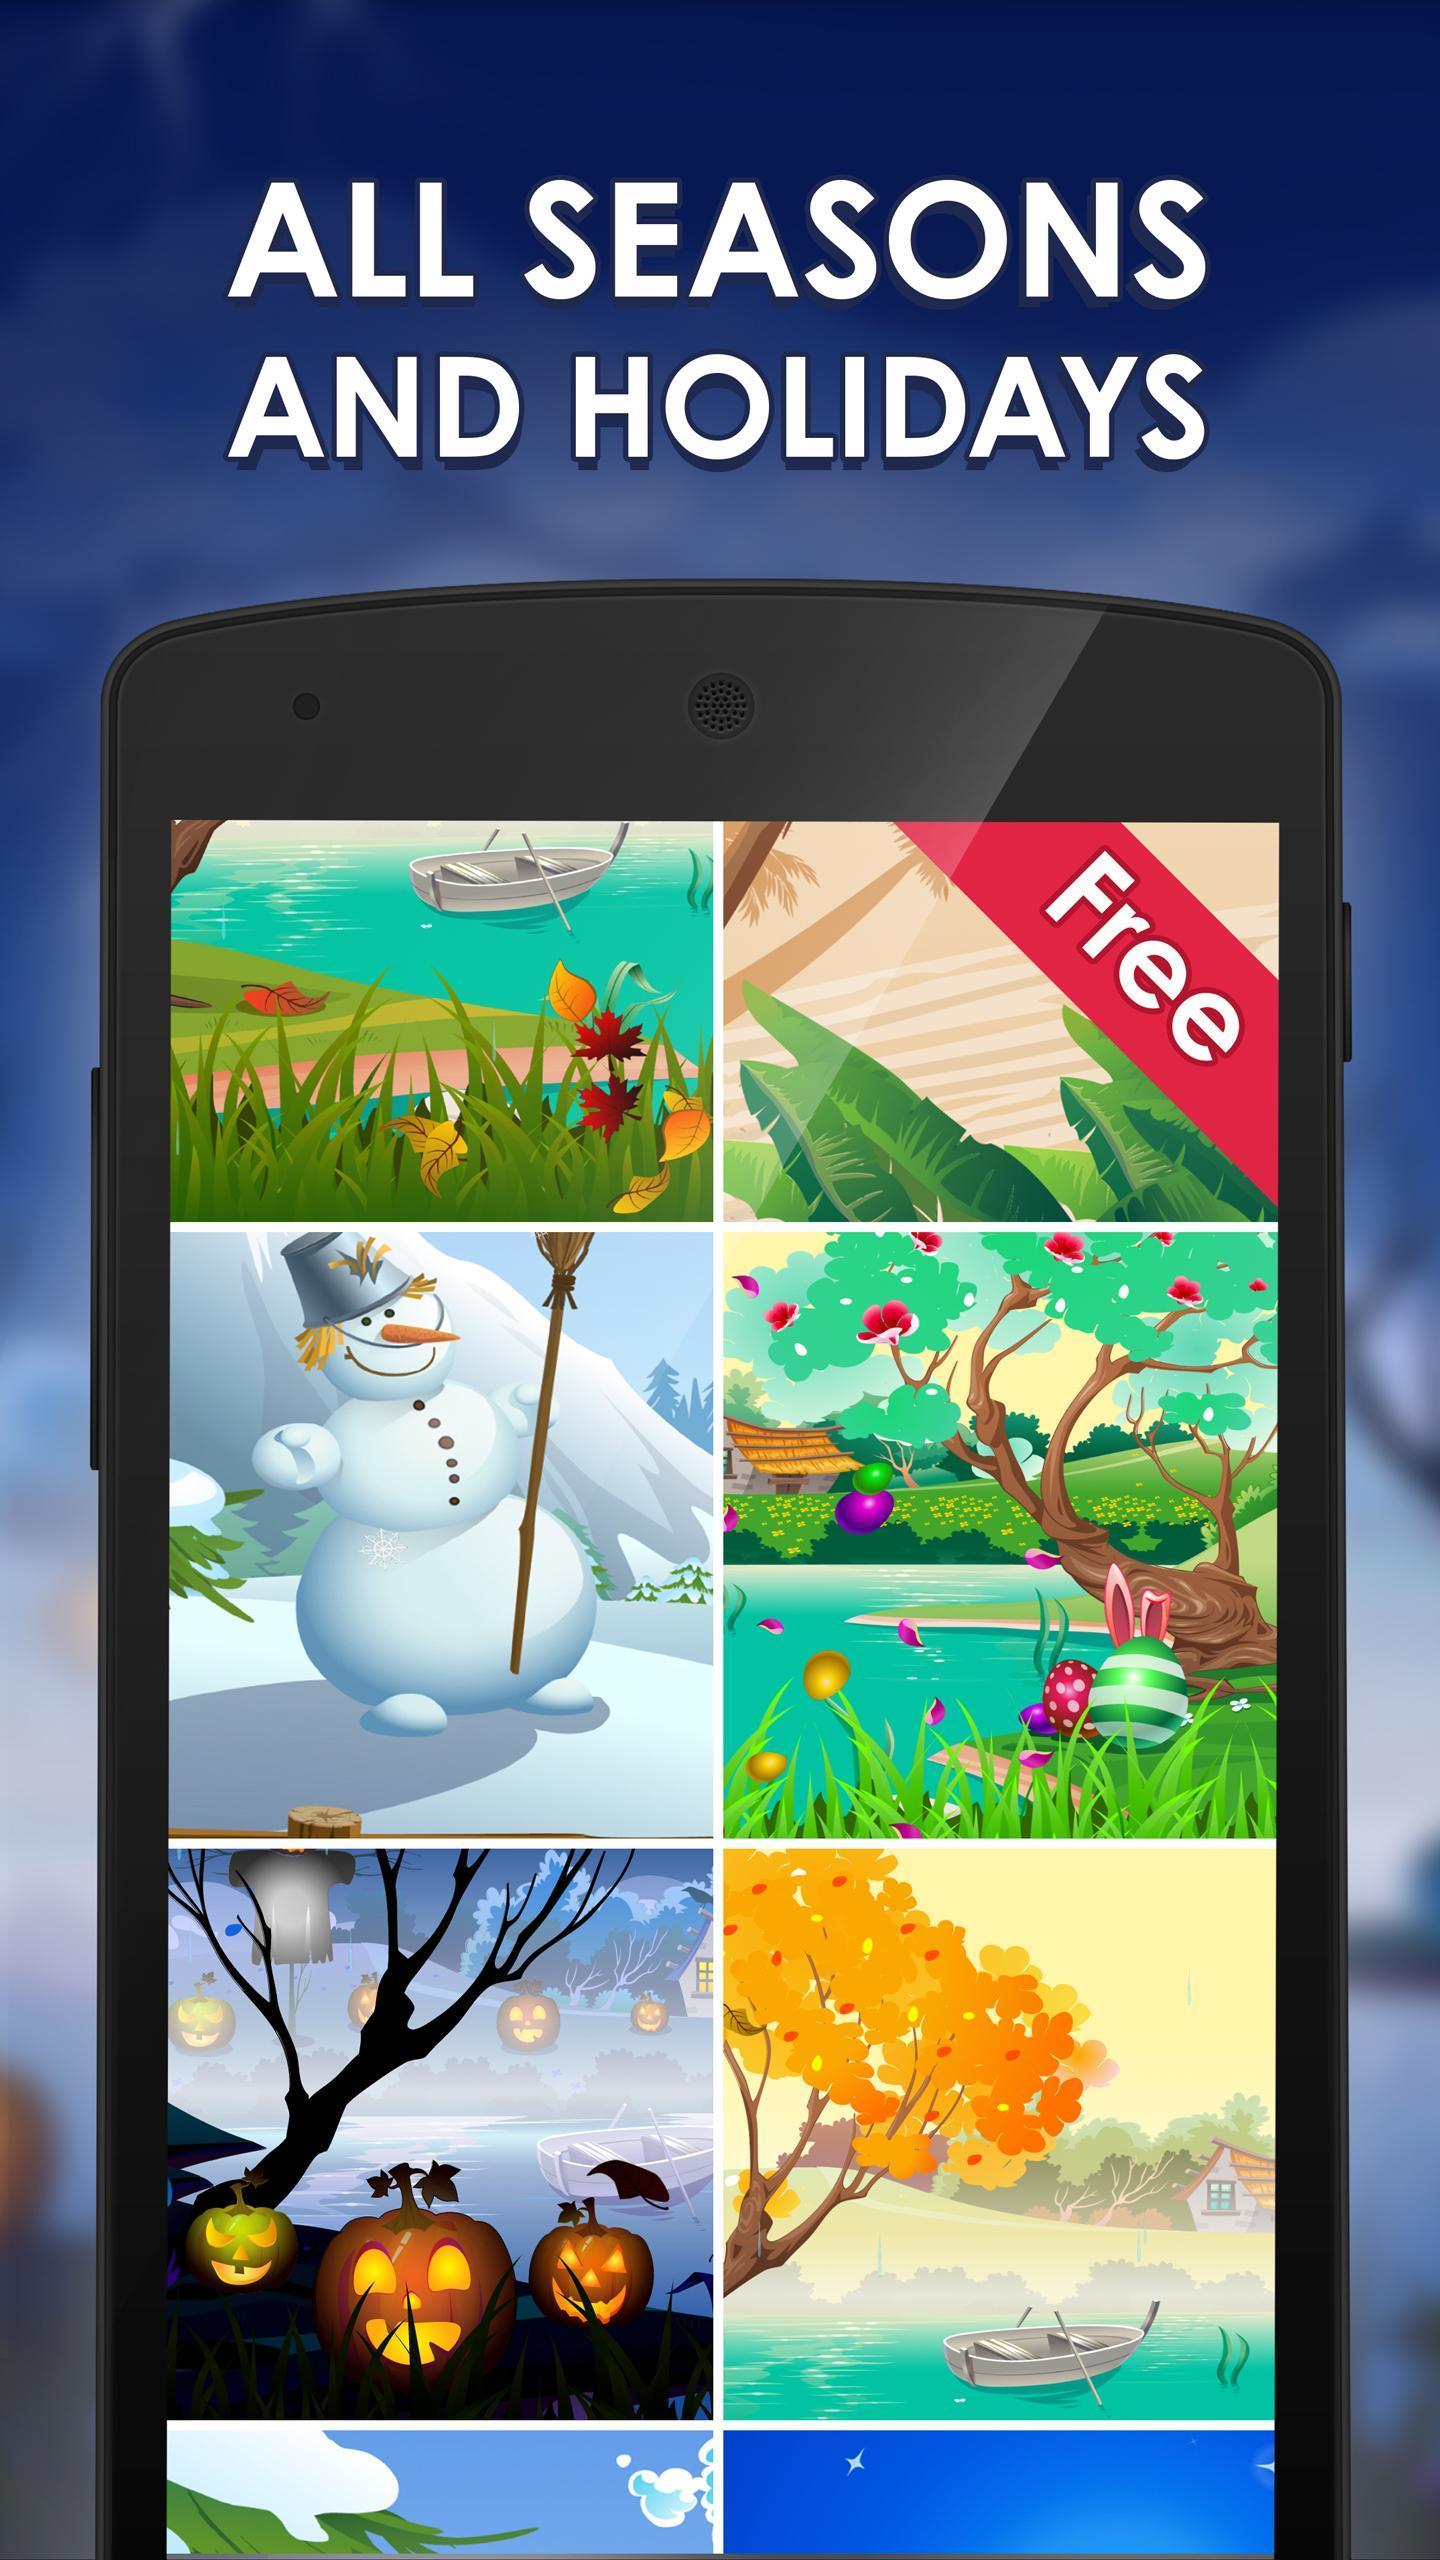 Spring and Easter Live Wallpaper + Tamagotchi Pet screenshot 3